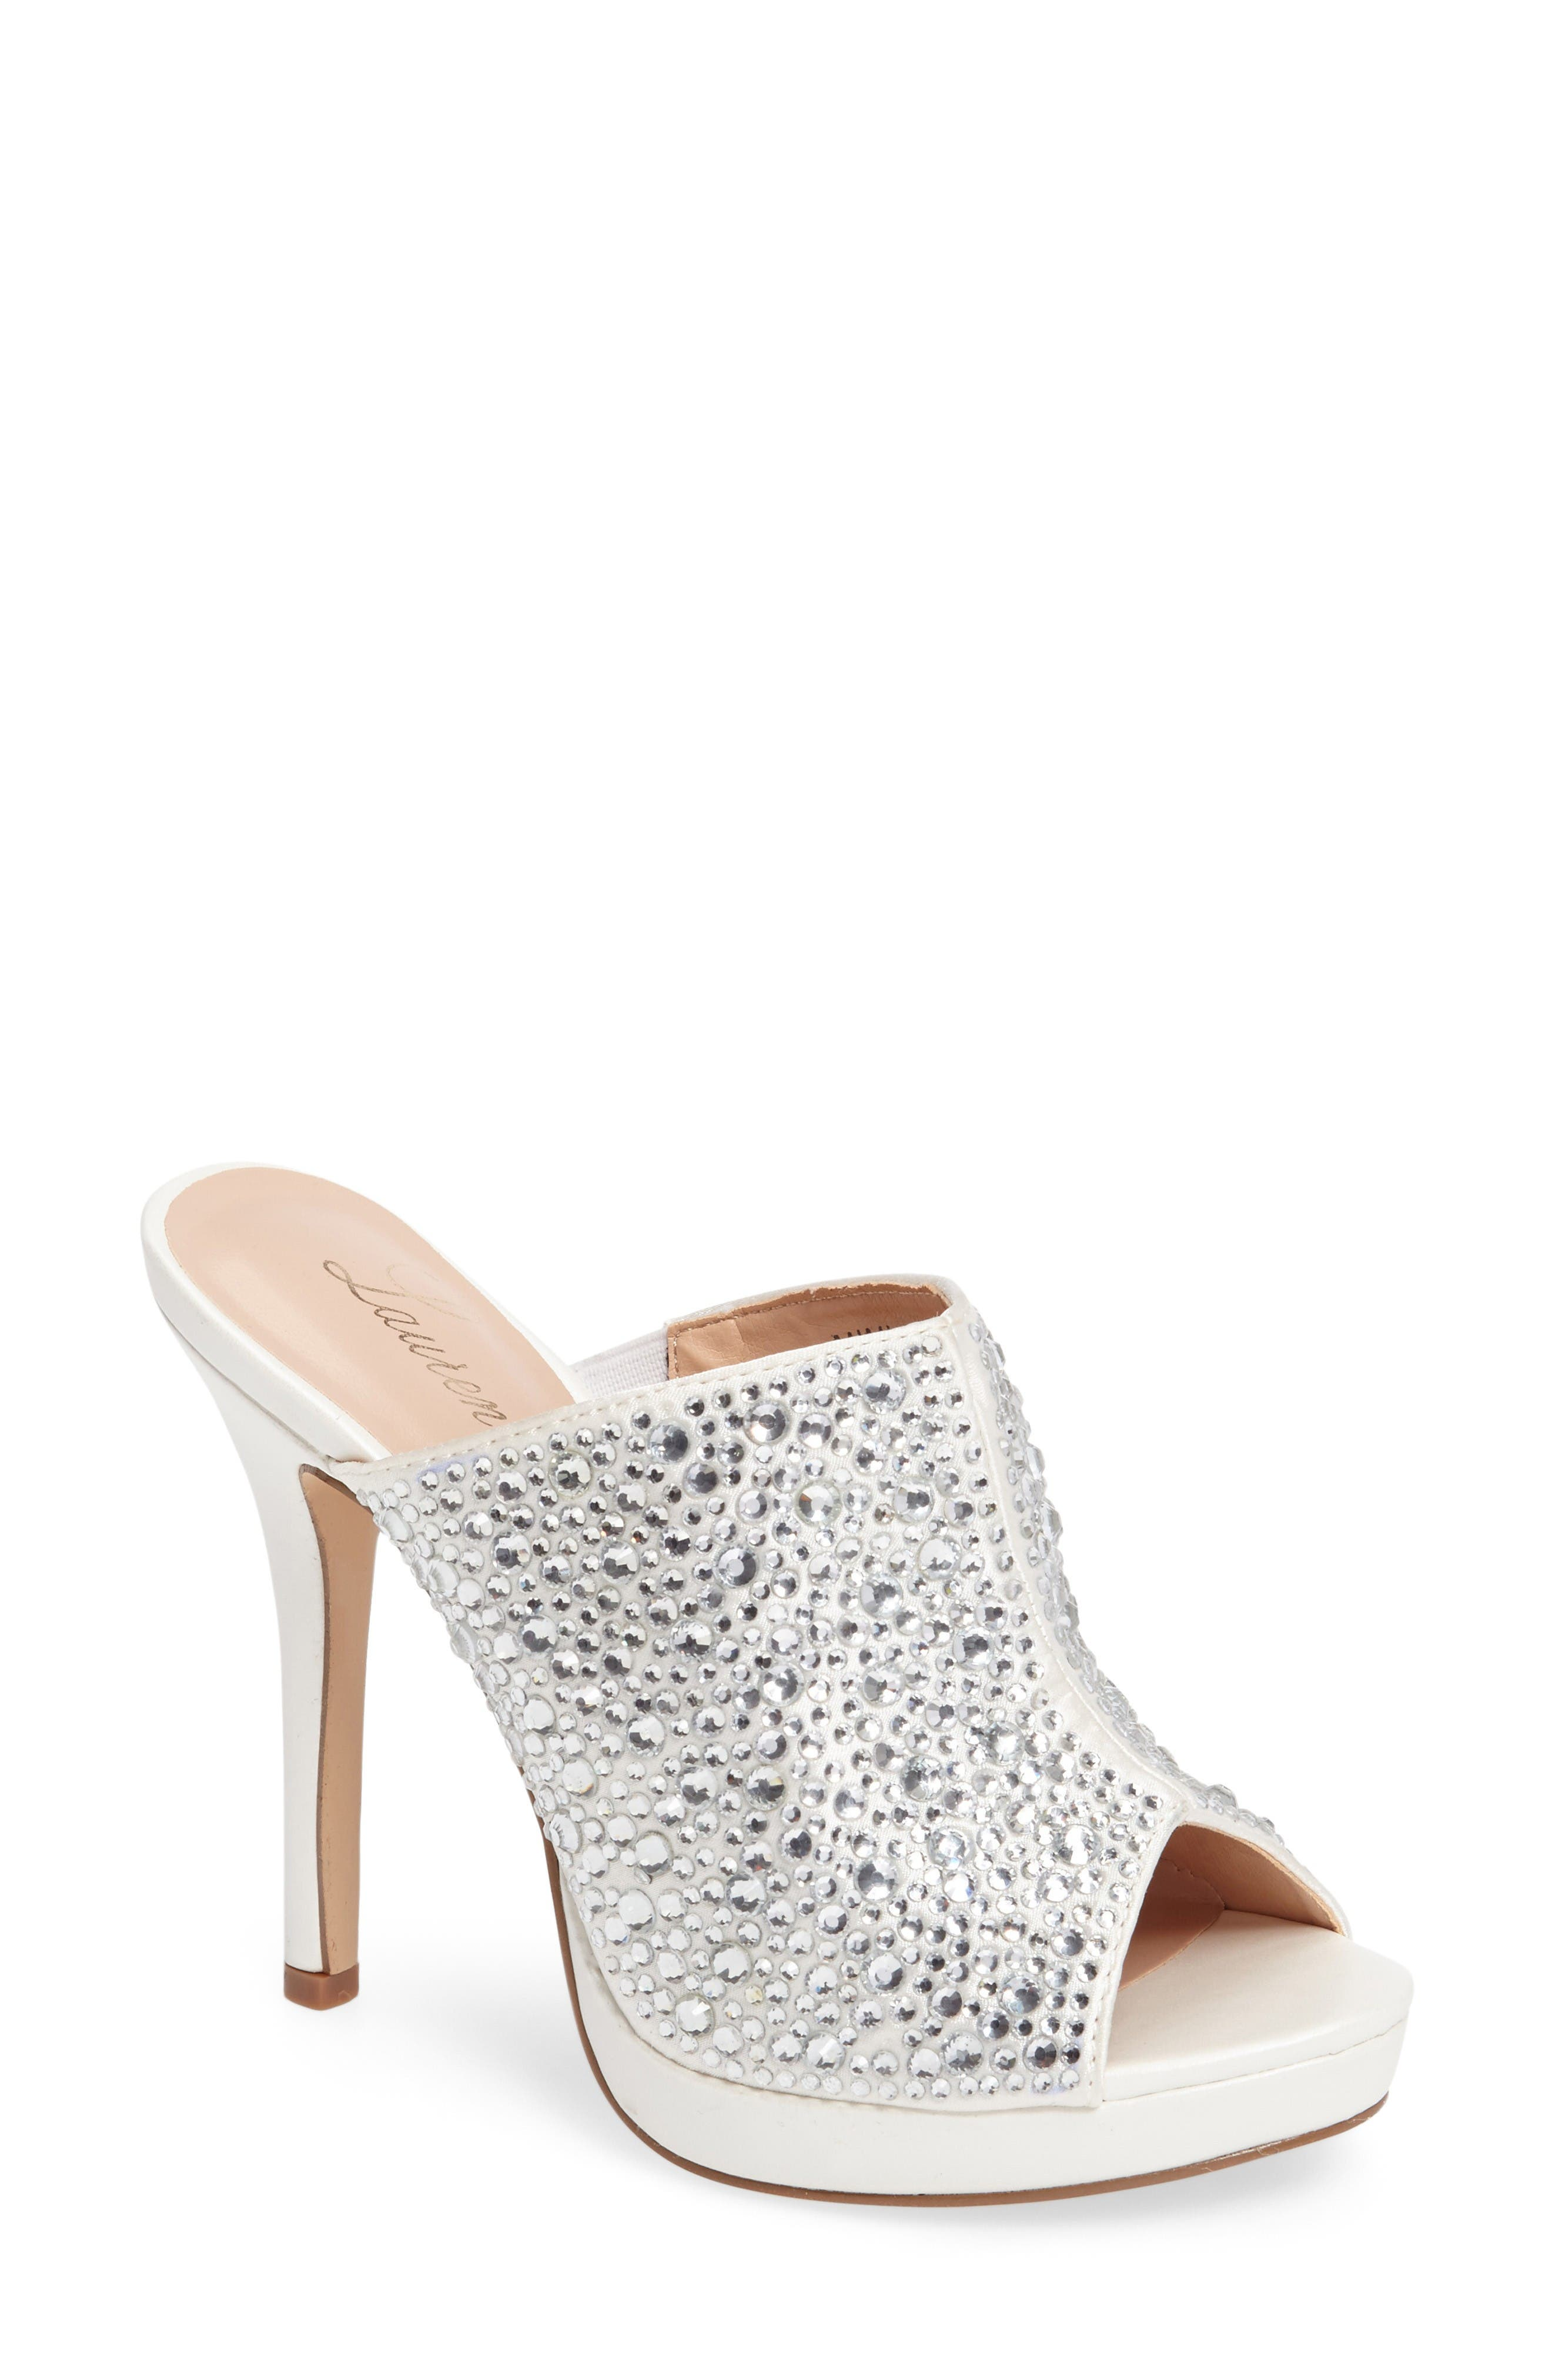 LAUREN LORRAINE Mimi Embellished Slide Sandal